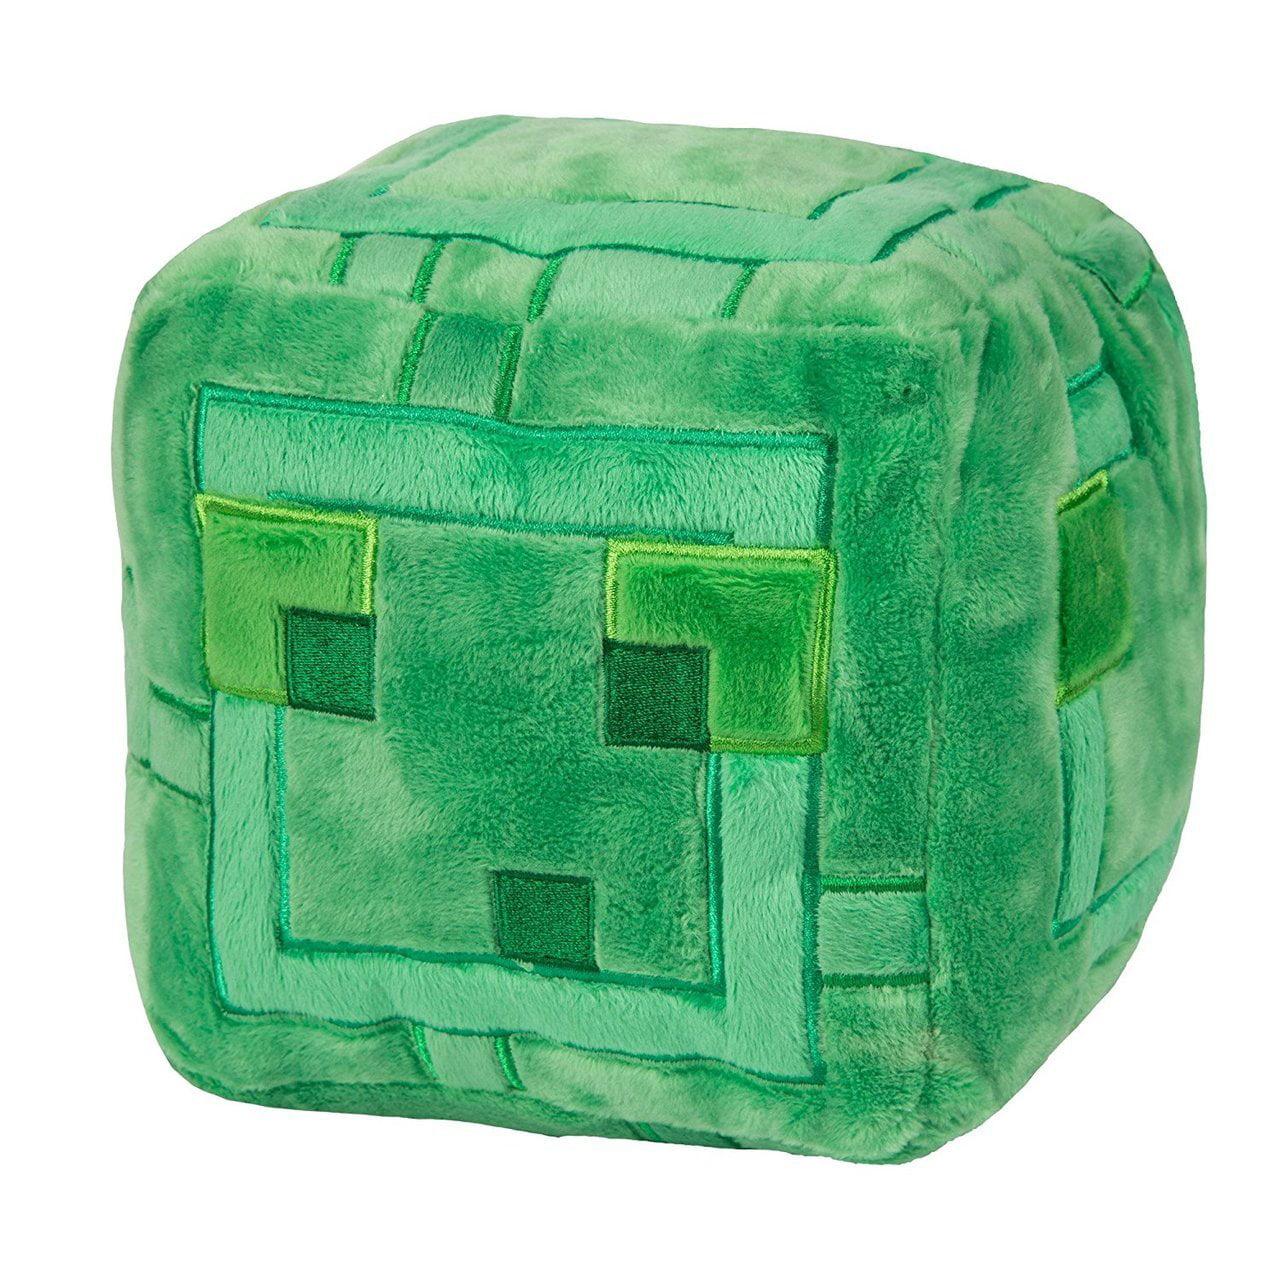 Plush Toy - Minecraft - Slime - 9.5 Inch - Jinx